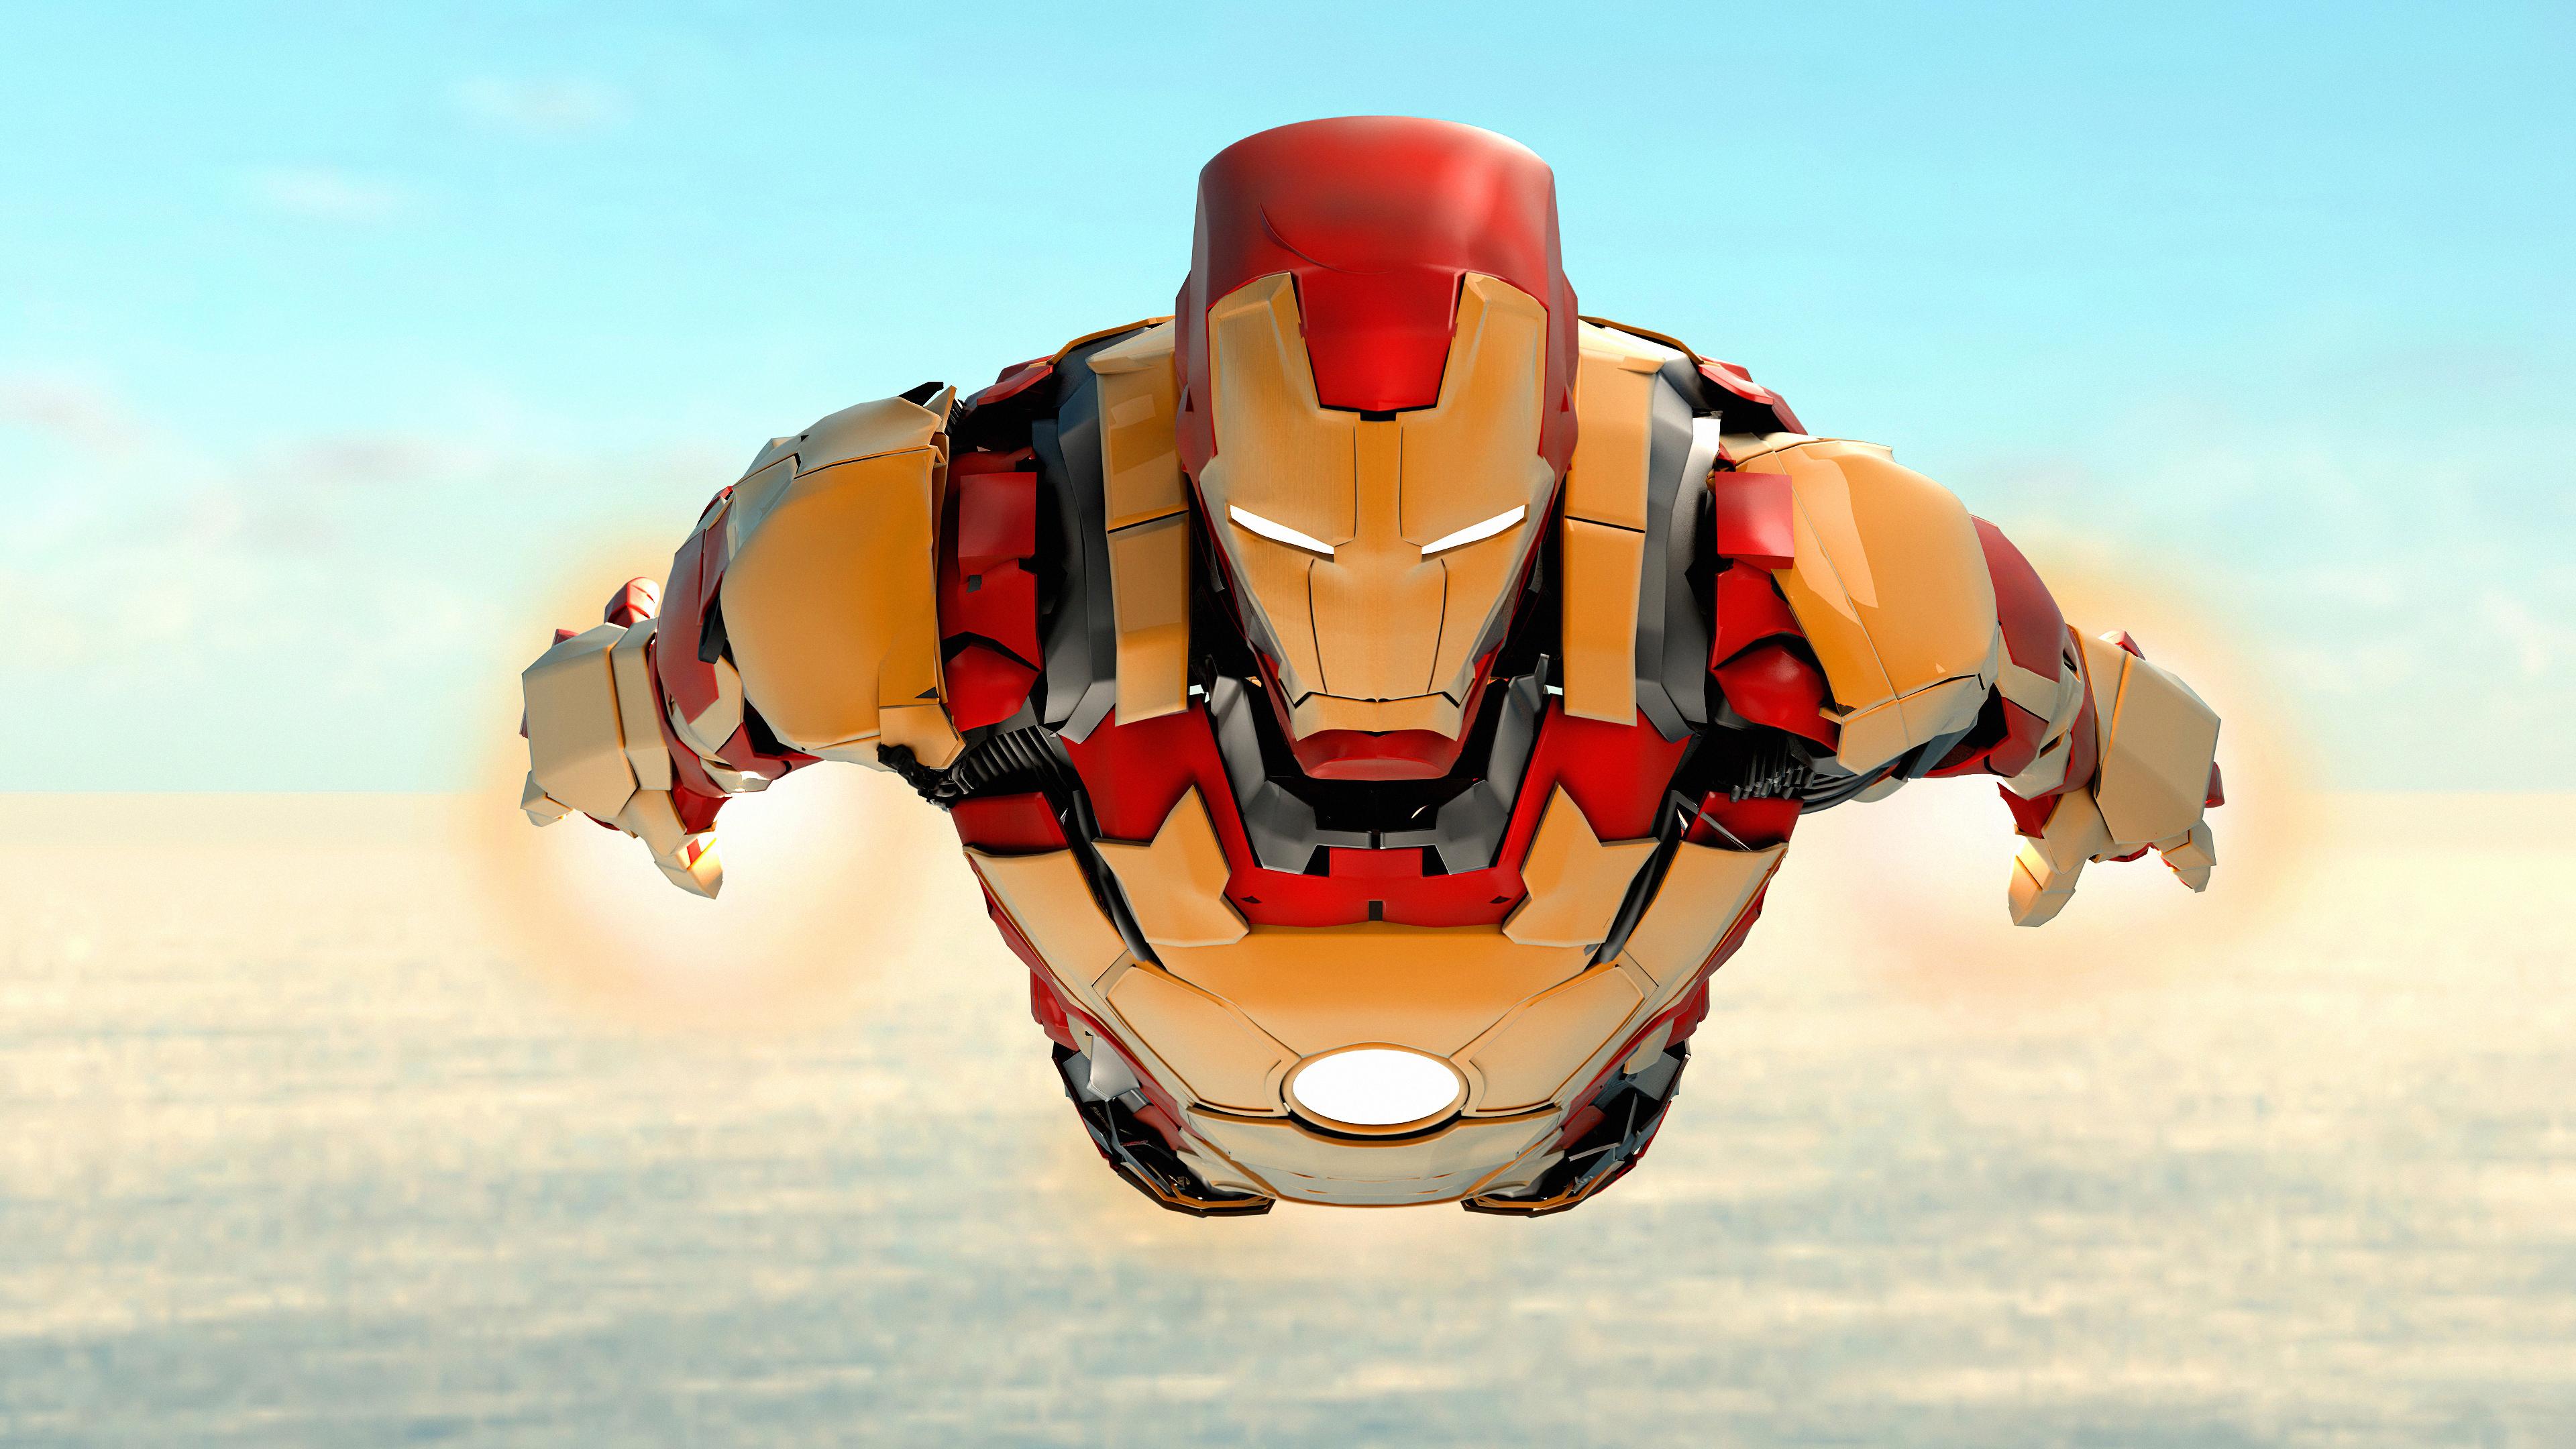 2020 iron man art 1580056503 - 2020 Iron Man Art - 2020 Iron Man Art wallpapers, 2020 Iron Man Art 4k wallpapers